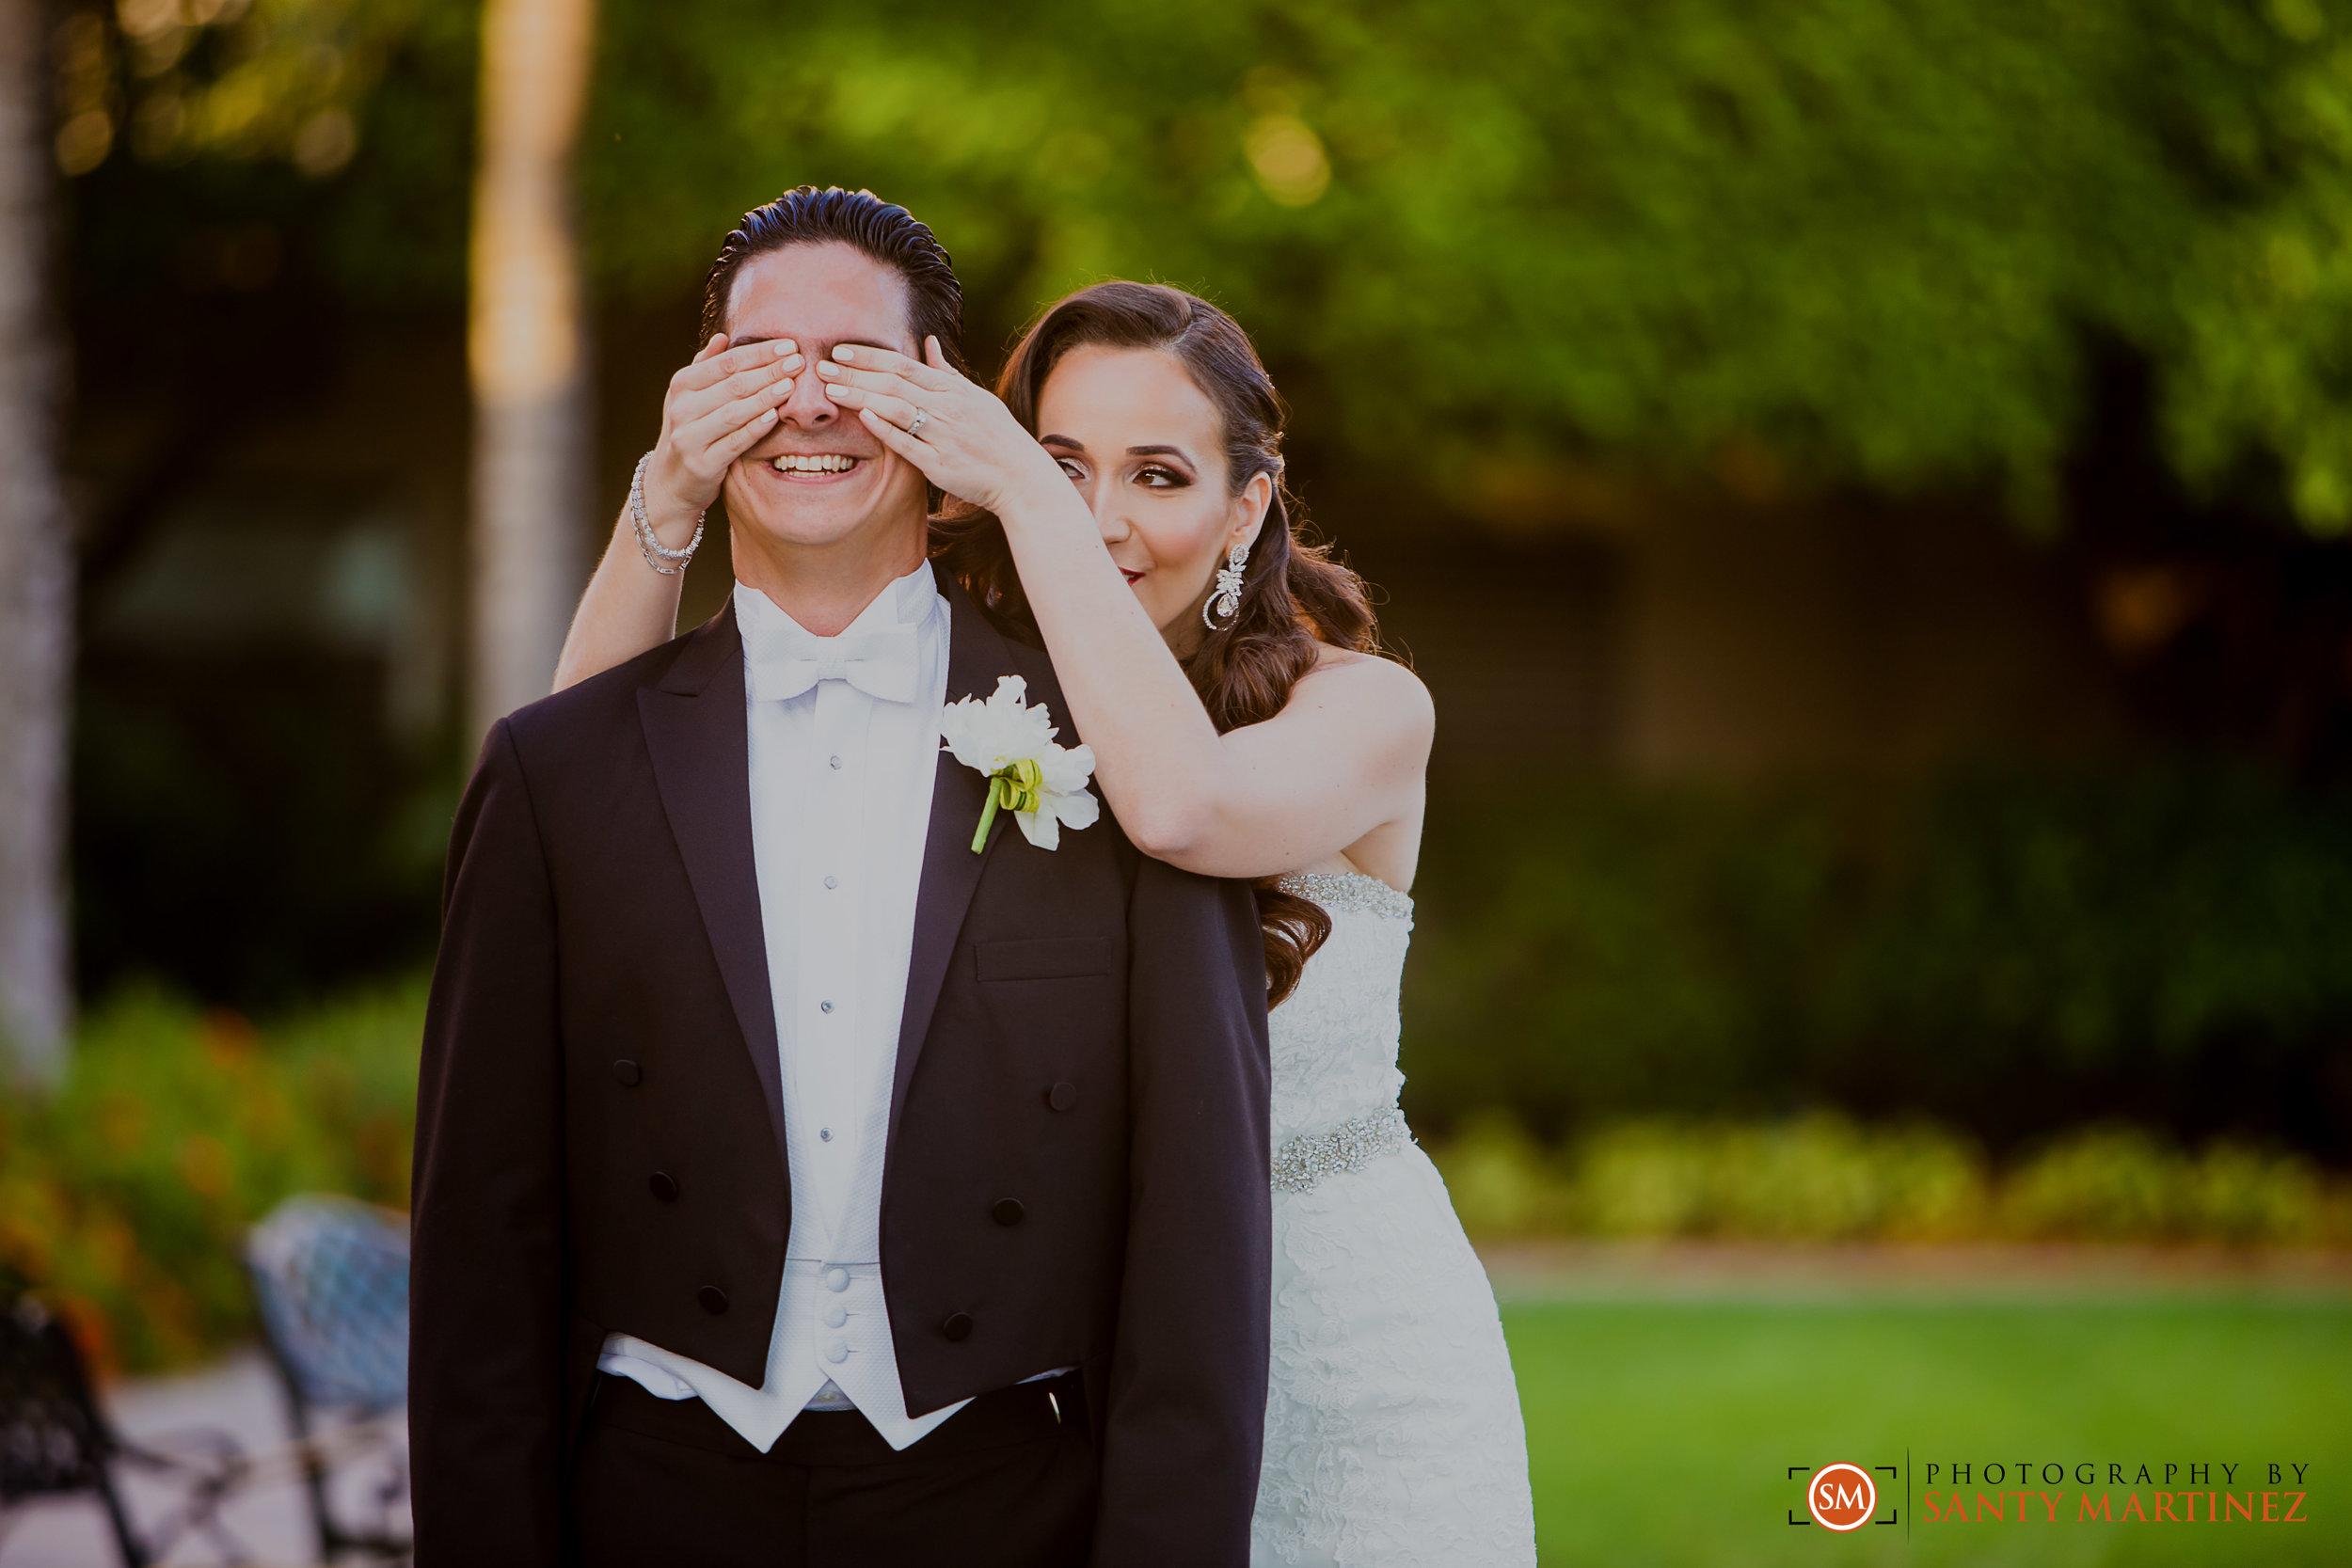 Miami Wedding Photographer - Santy Martinez-19.jpg